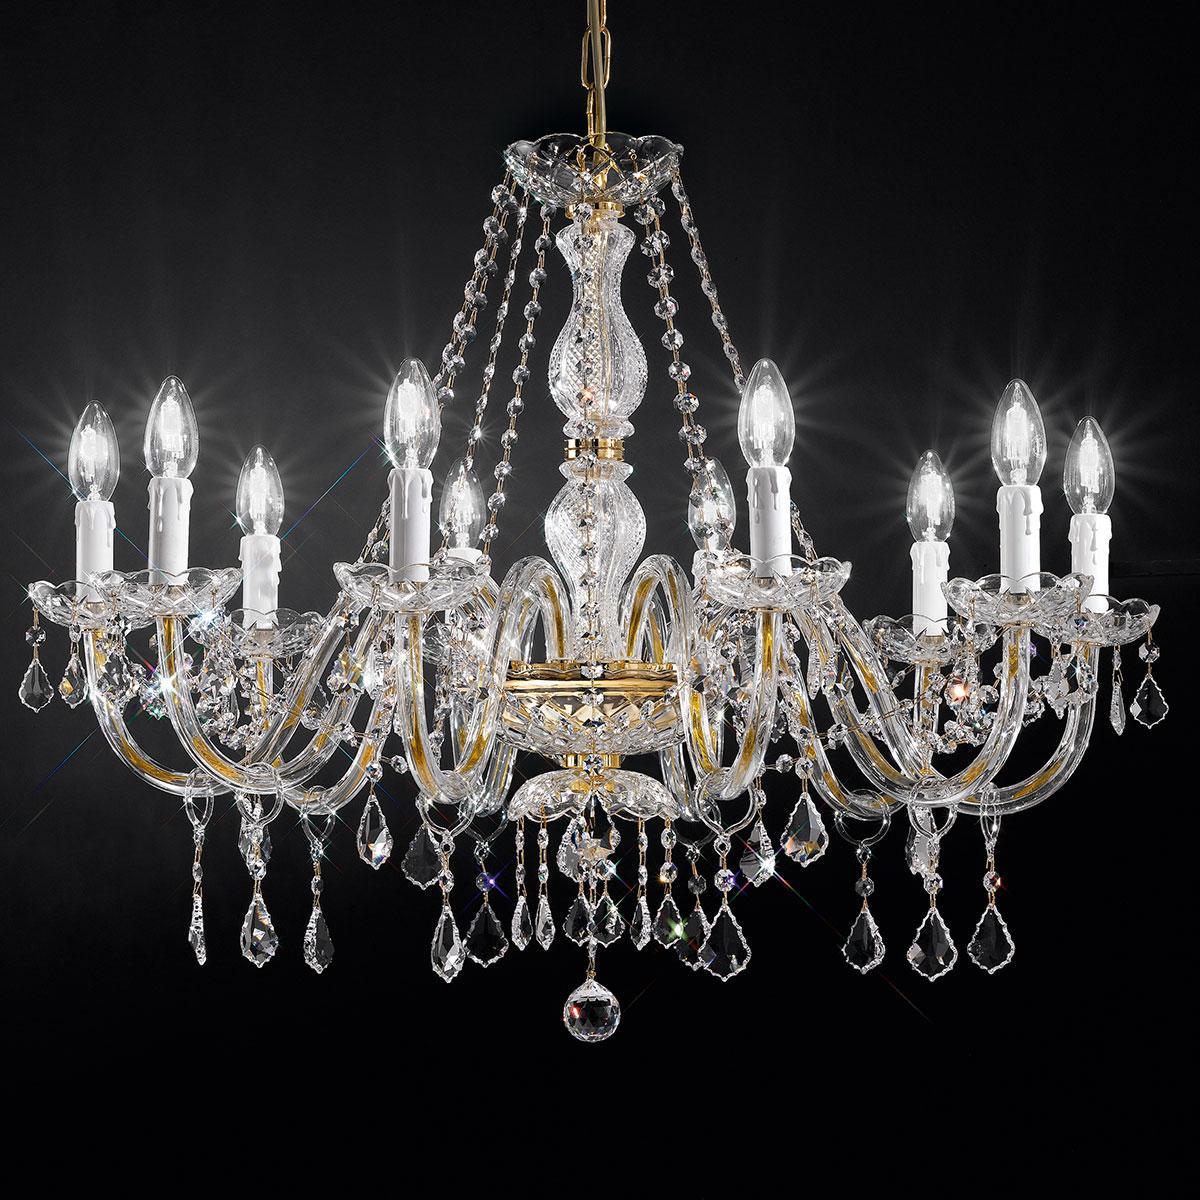 """Botticelli"" venezianischer kristall kronleuchter - 10 flammig - transparent mit kristal Asfour"